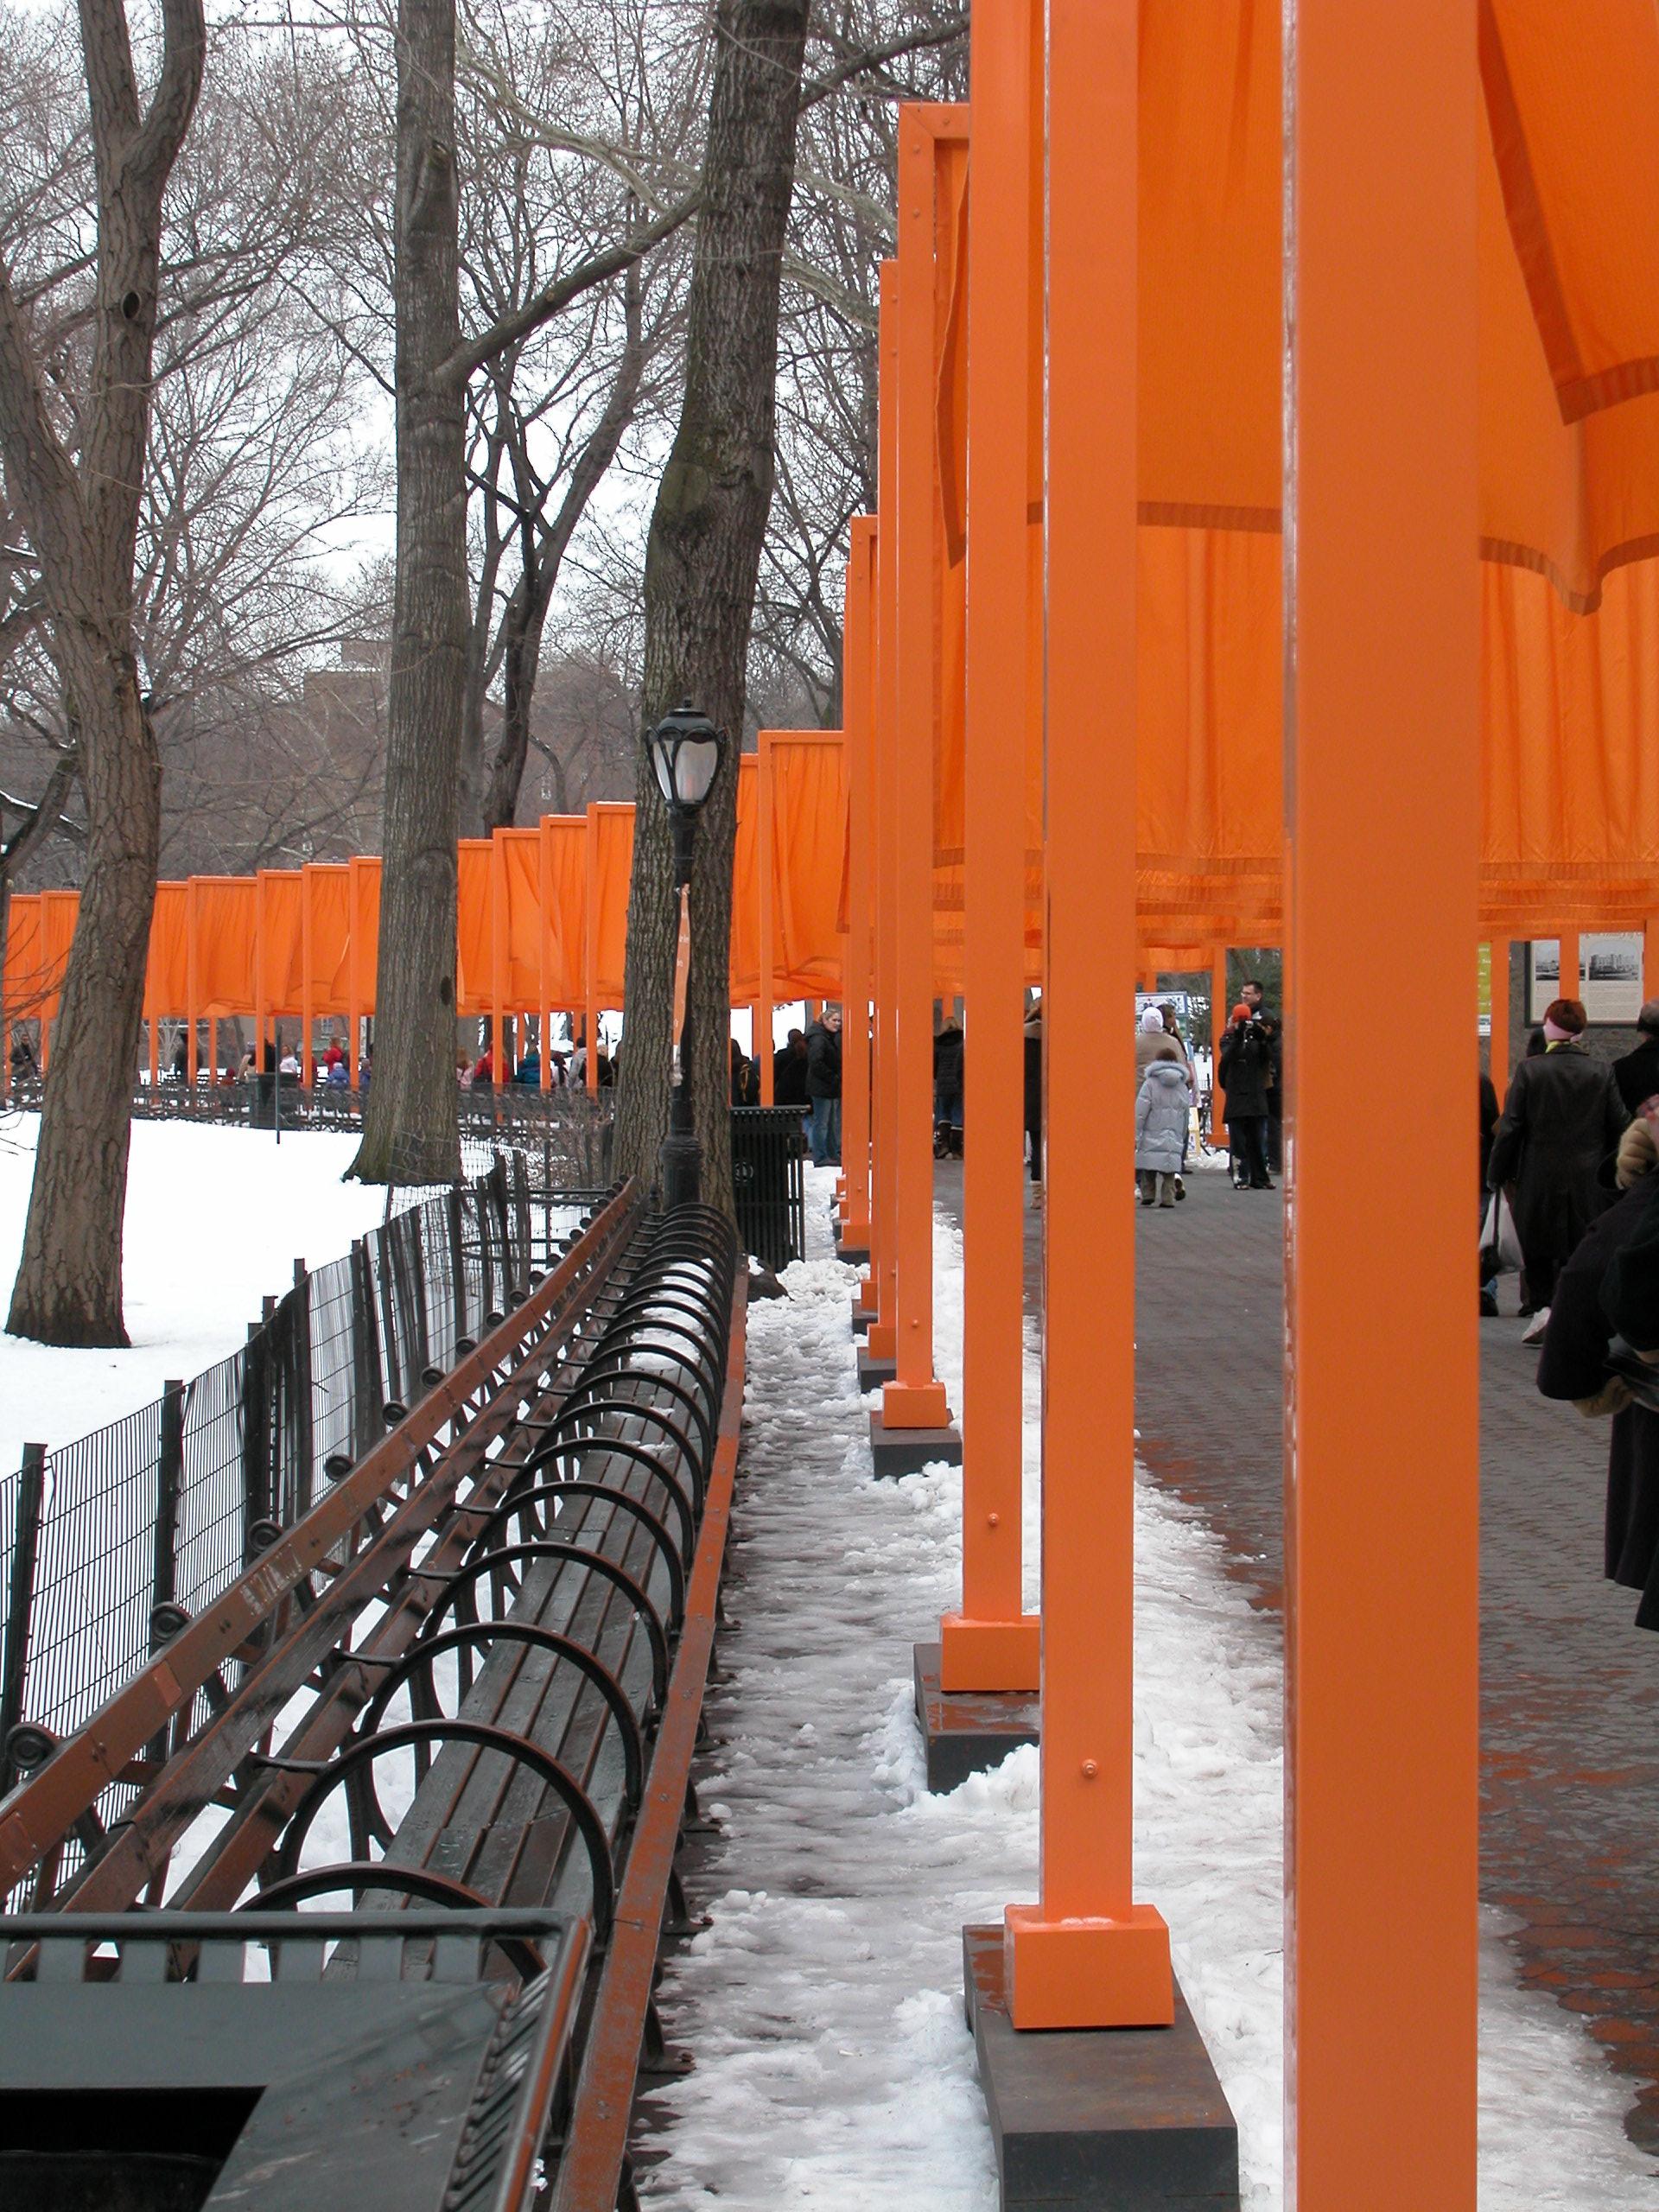 The Gates - Central Park 02-2005 007